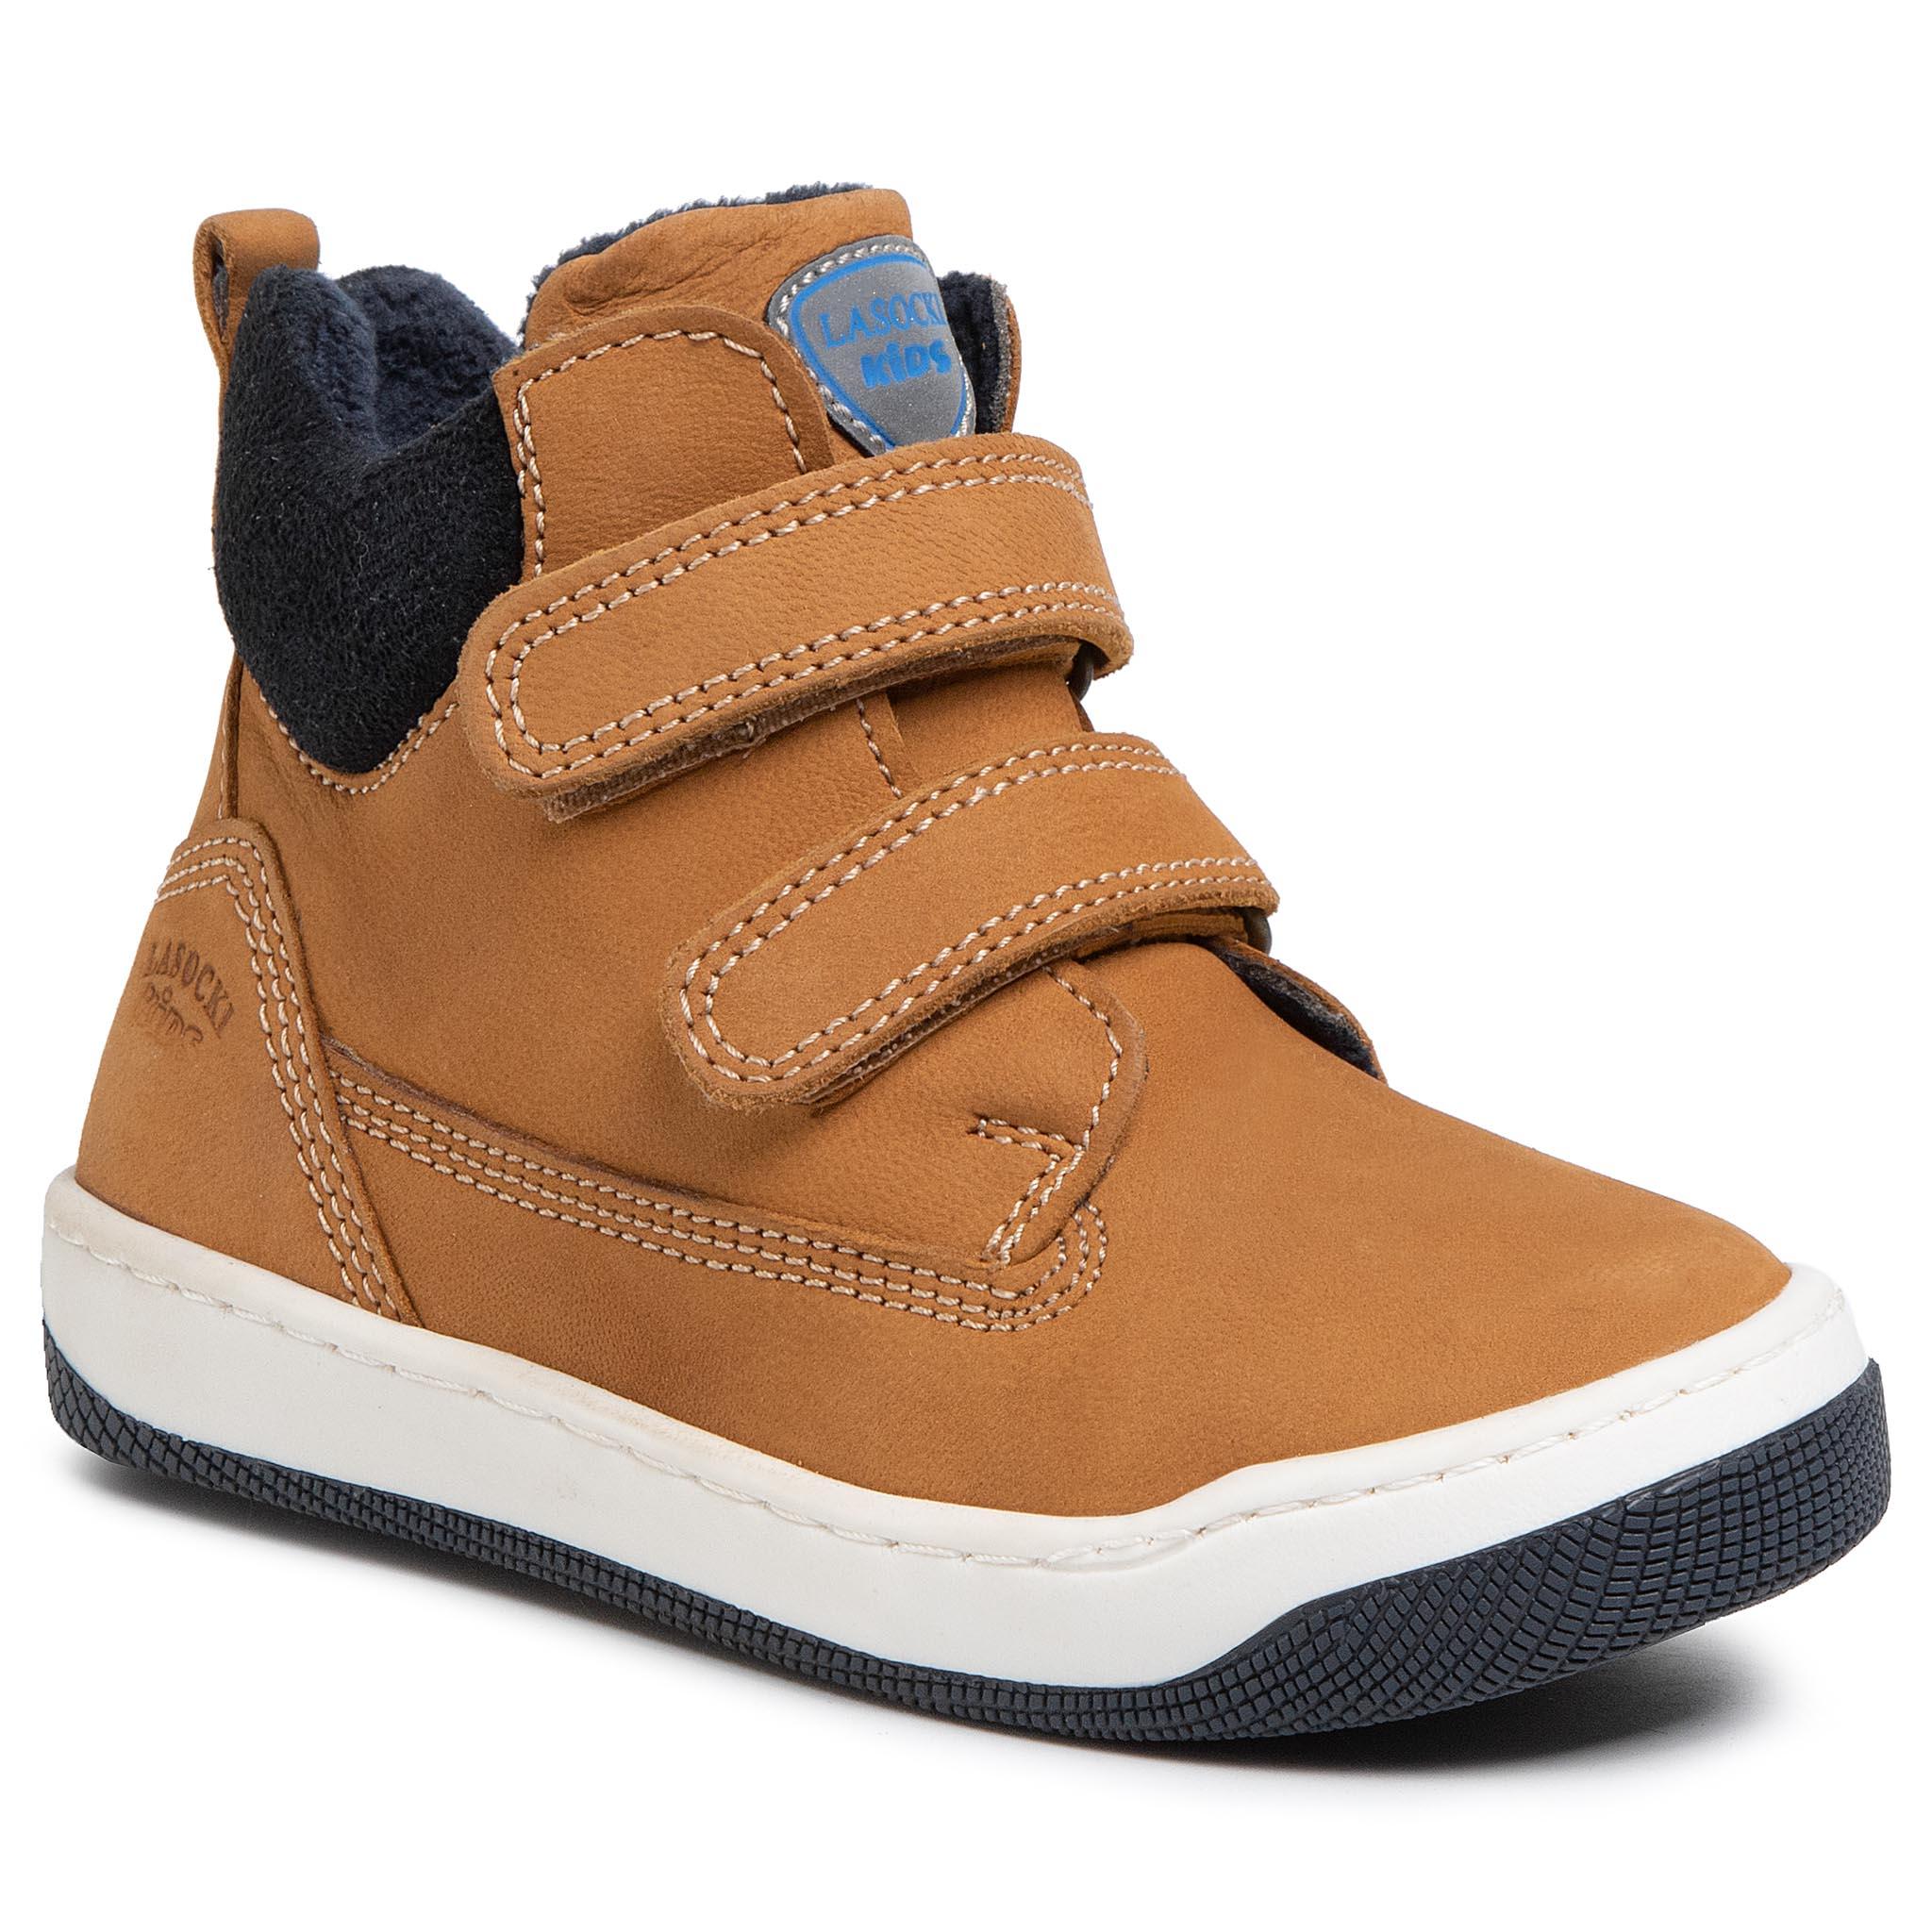 Outdoorová obuv LASOCKI KIDS - CI12-SPRITE-01 Camel